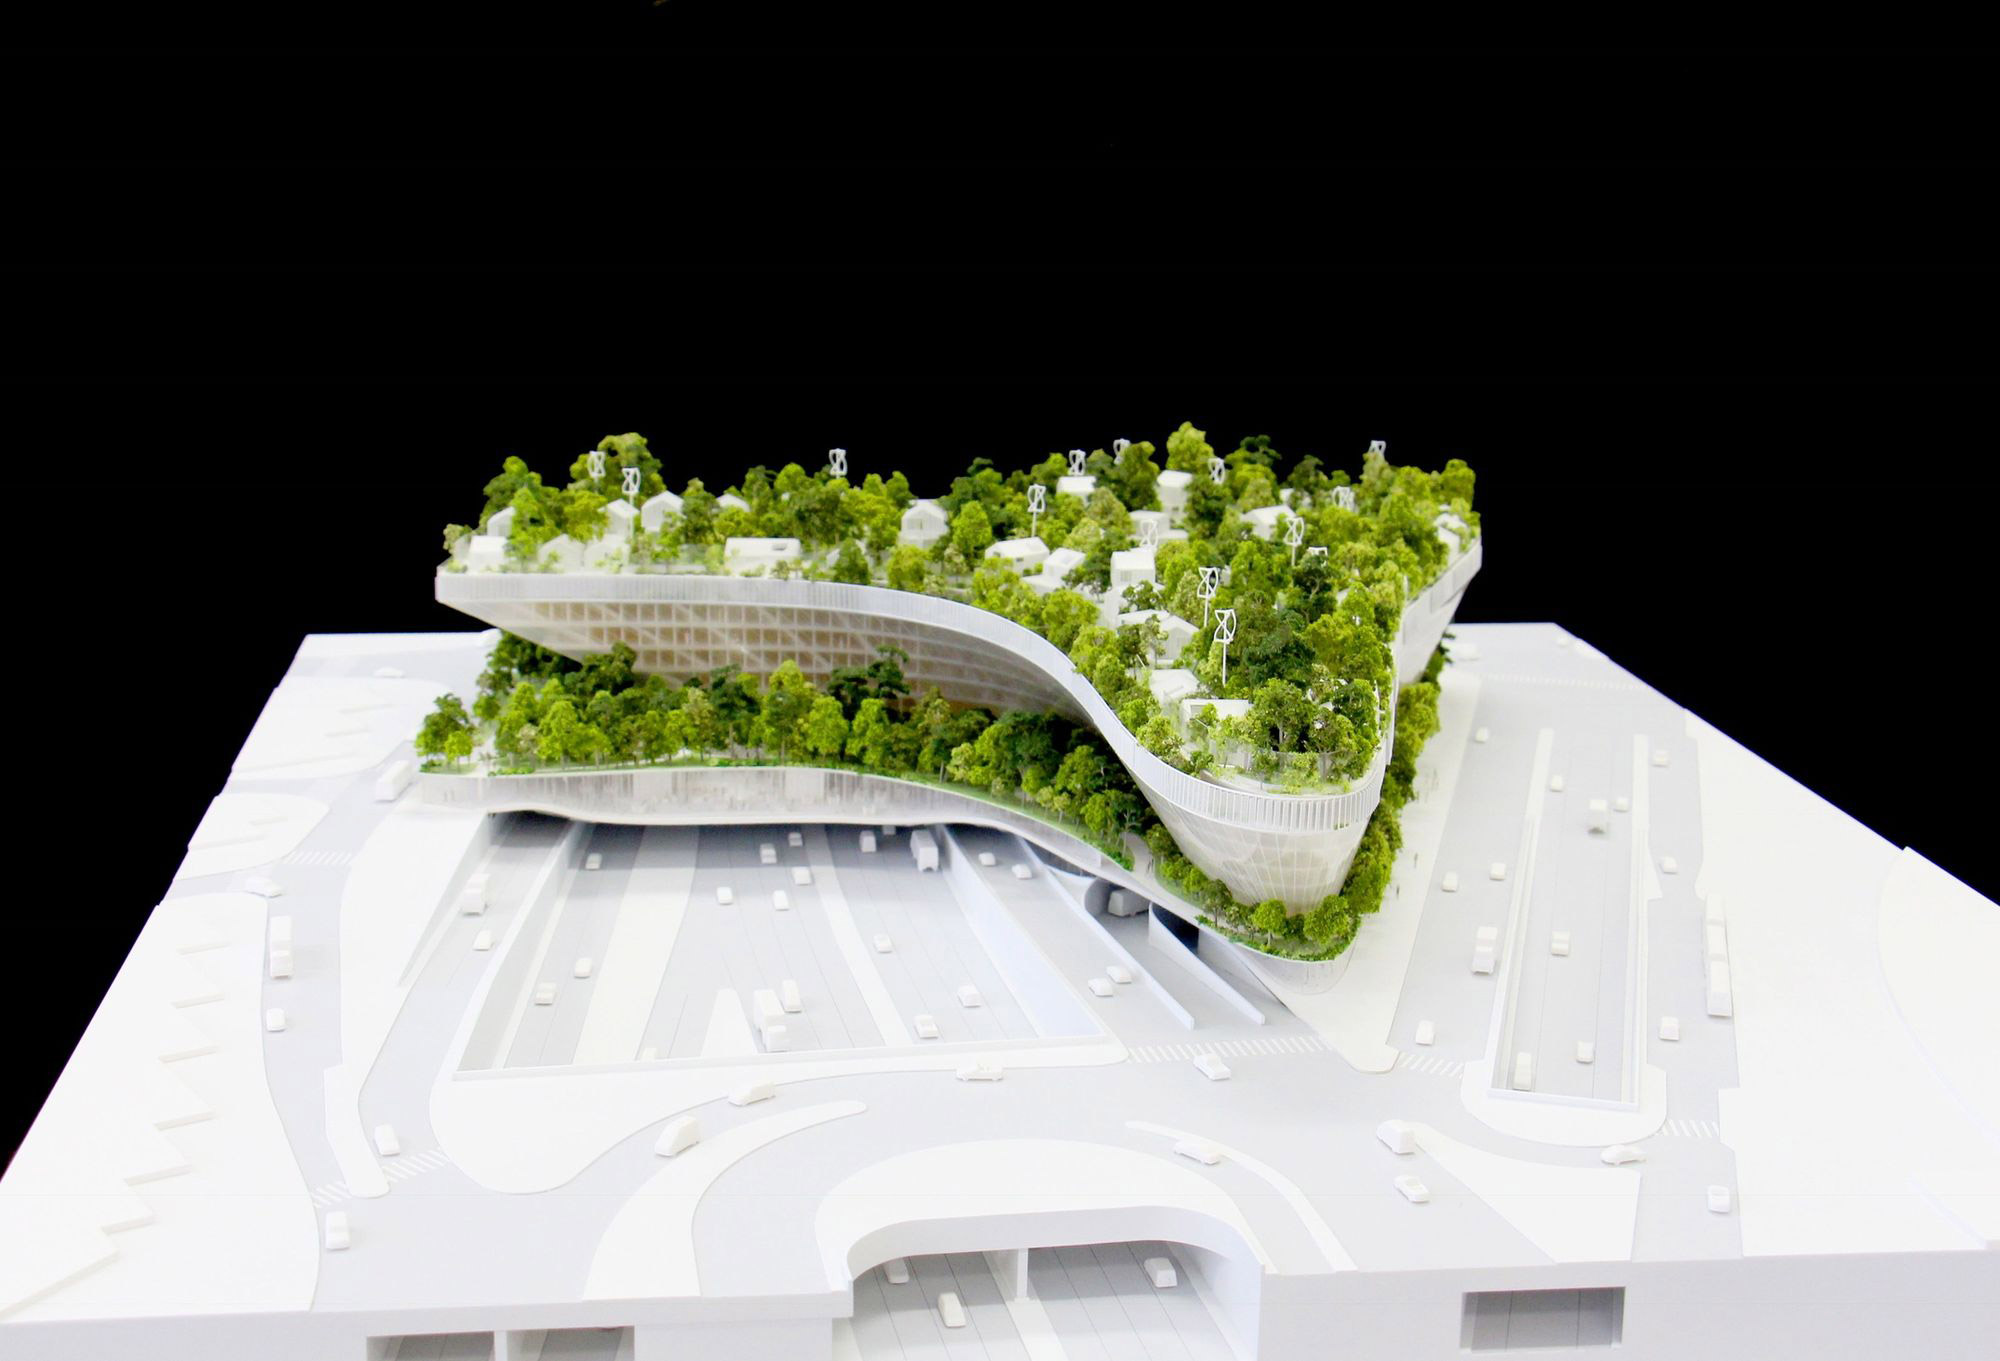 milles arbres in paris sou fujimoto oxo architectes archeyes. Black Bedroom Furniture Sets. Home Design Ideas